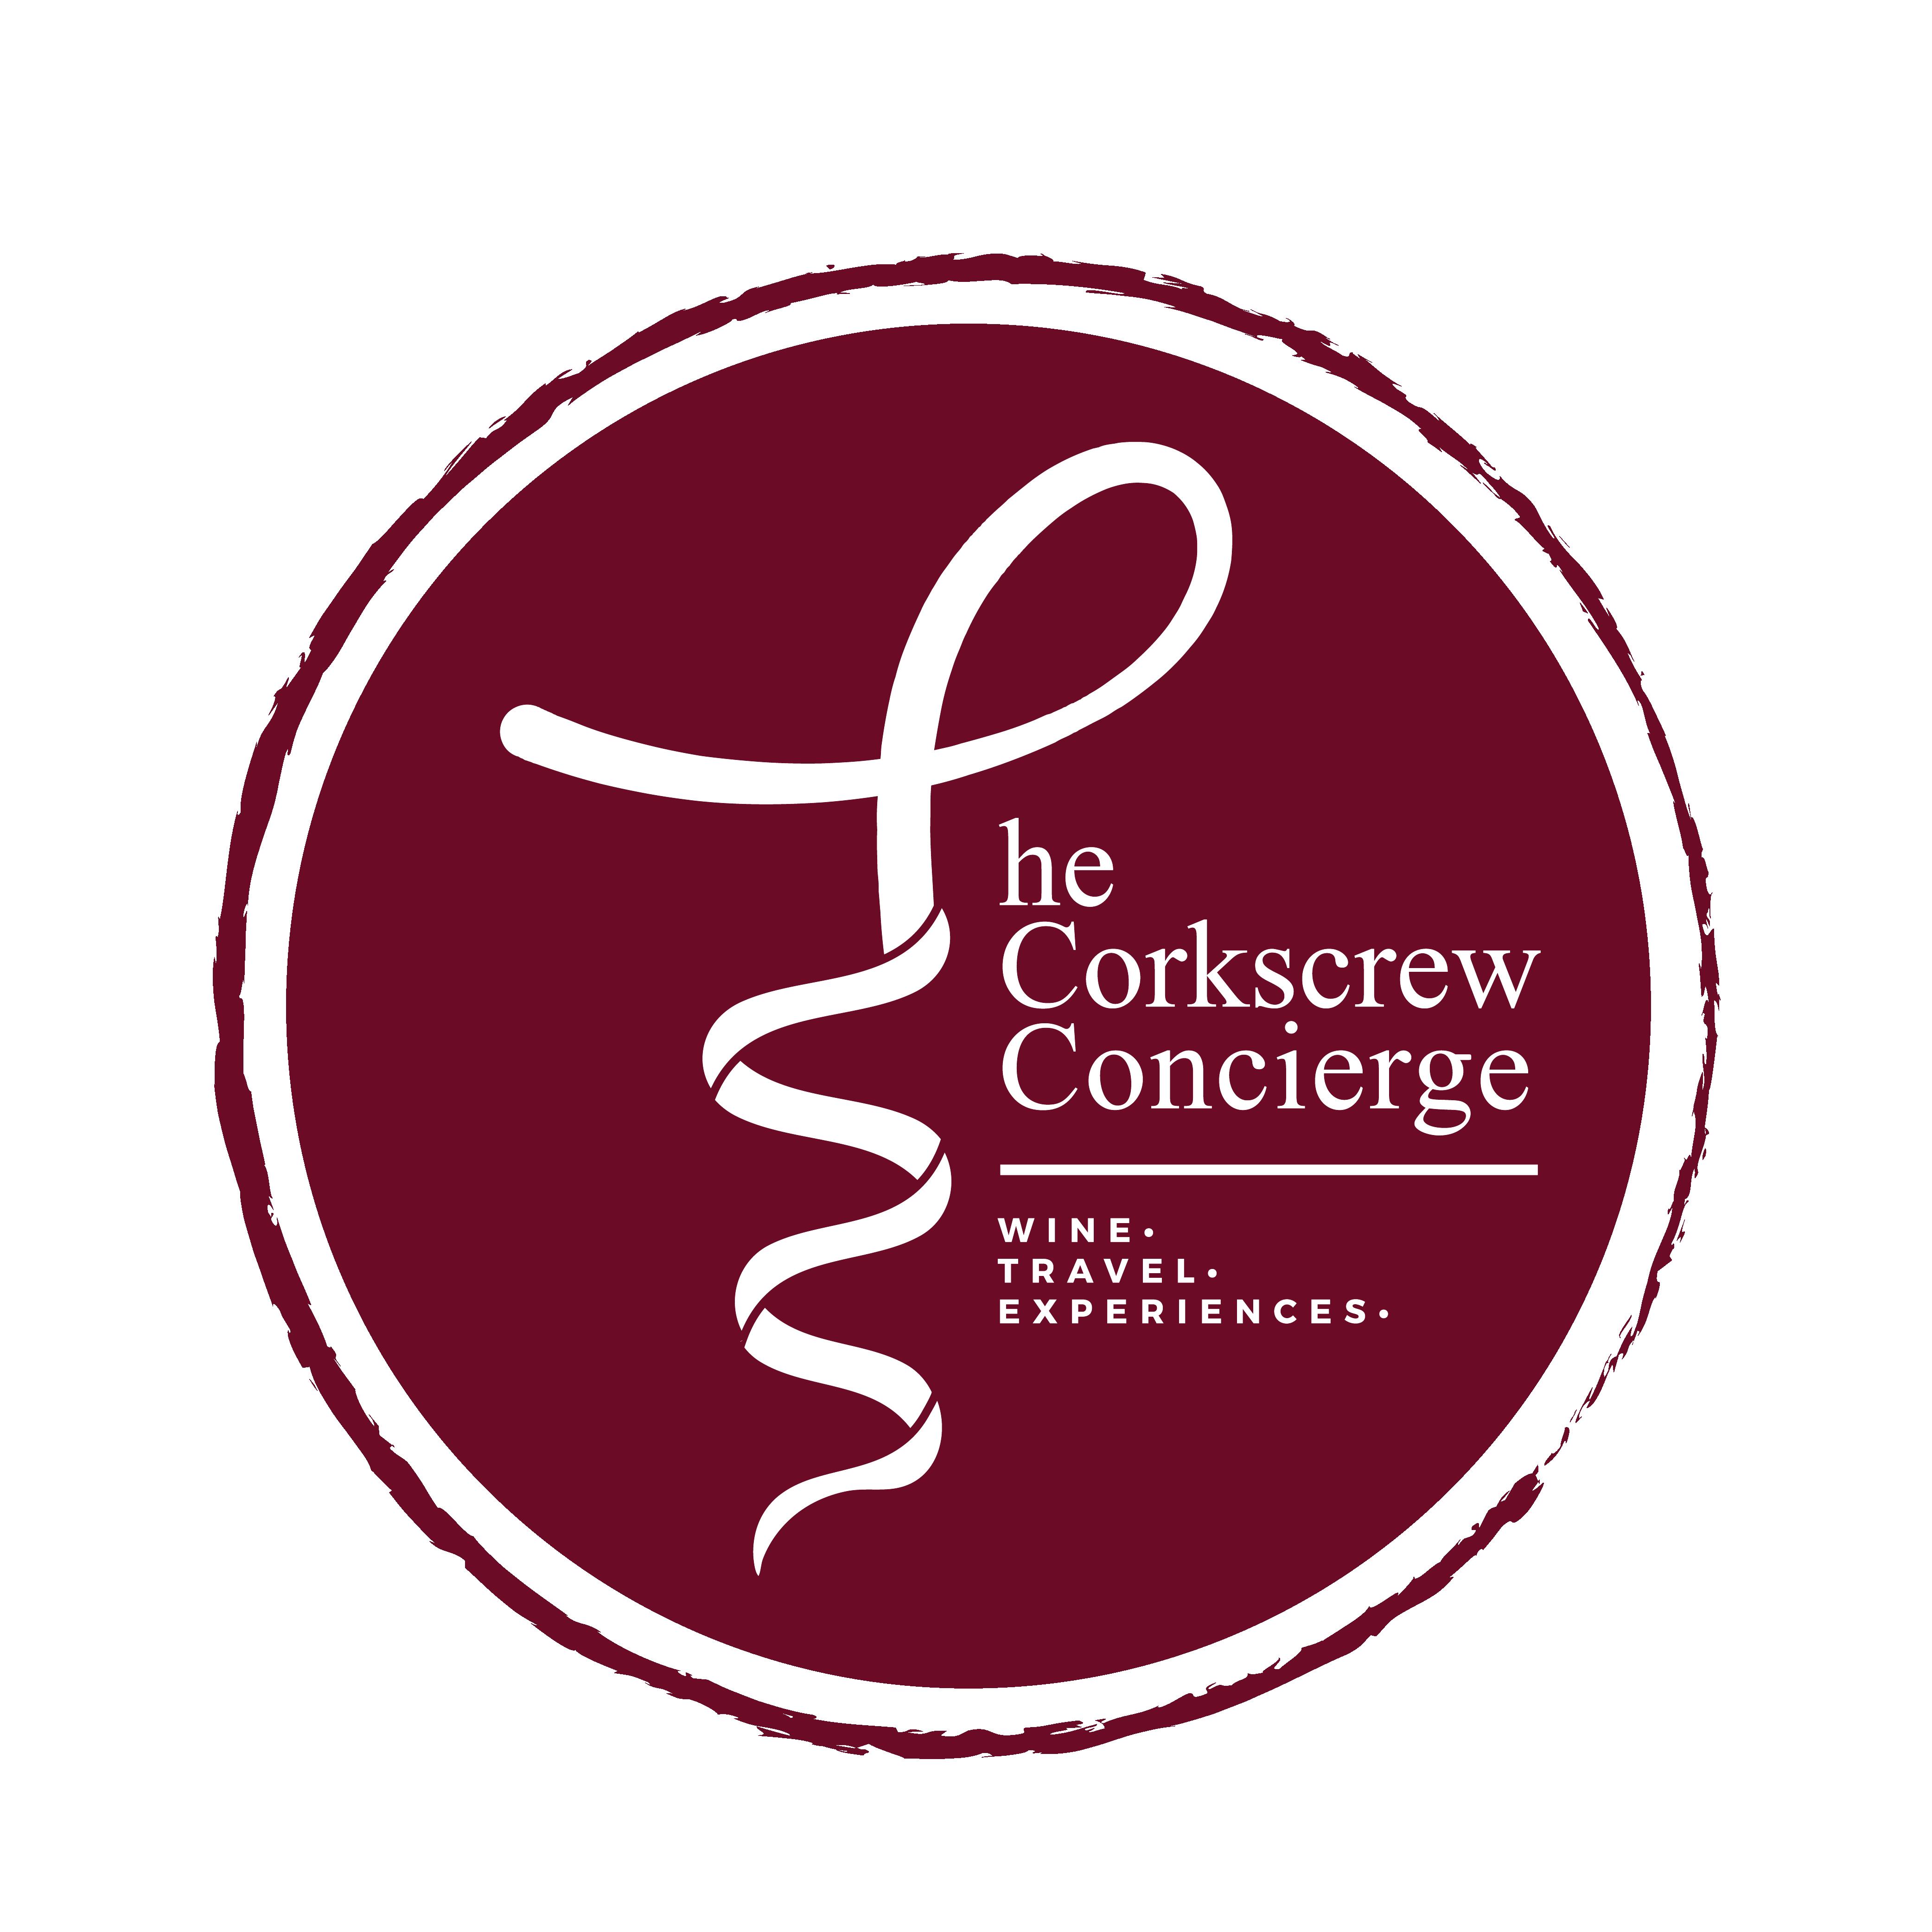 The Corkscrew Concierge Needs a New Wine Design